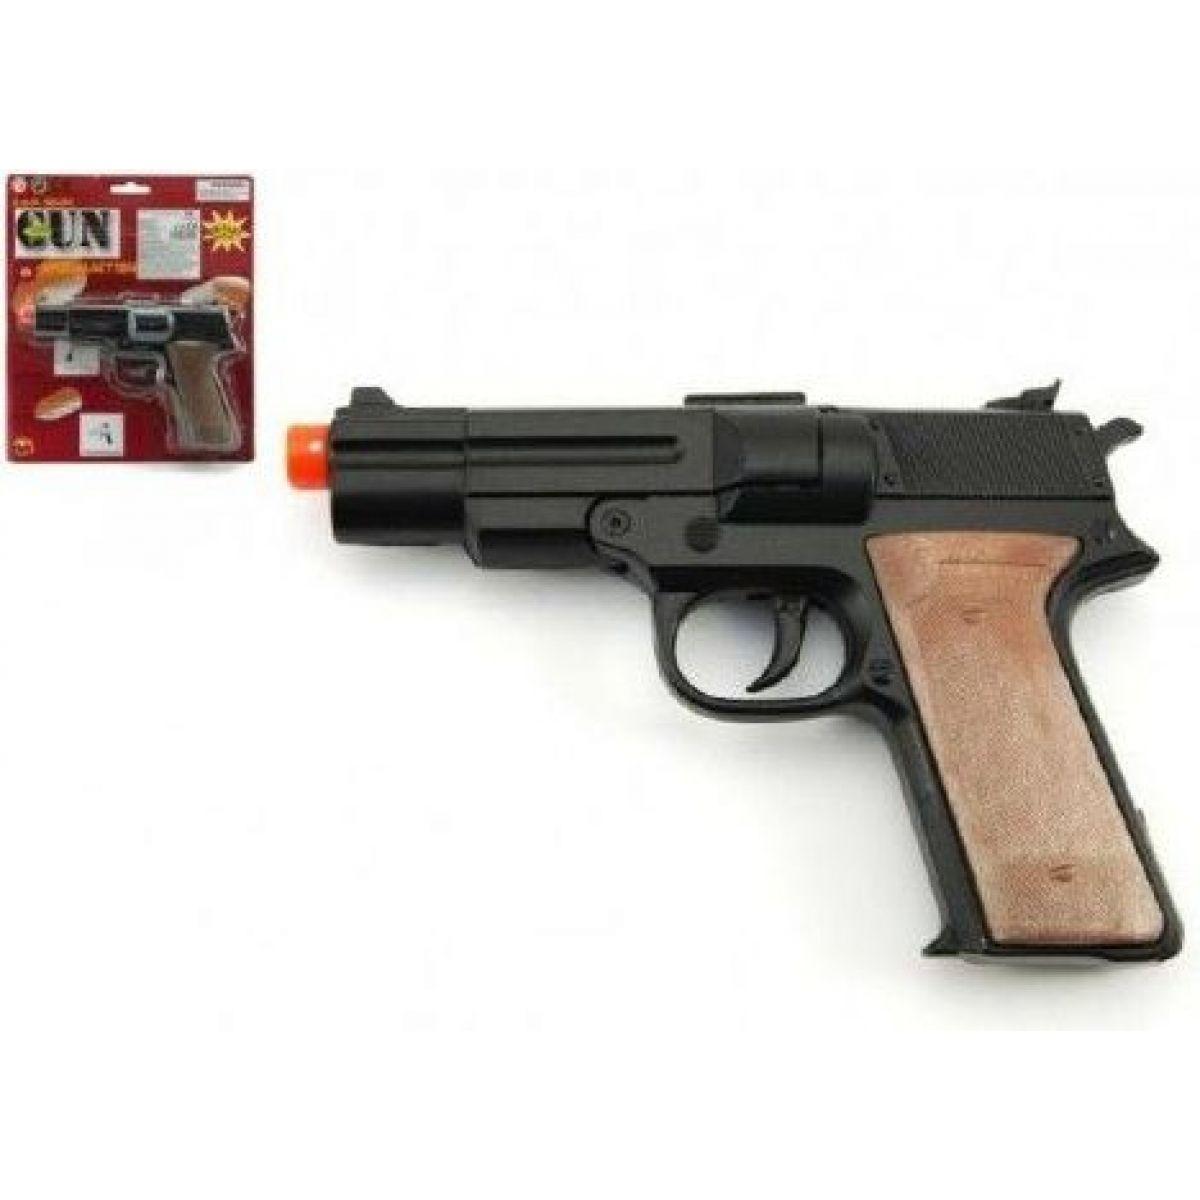 Rock David pistole na kapsle kov 14 cm 8 ran na kartě